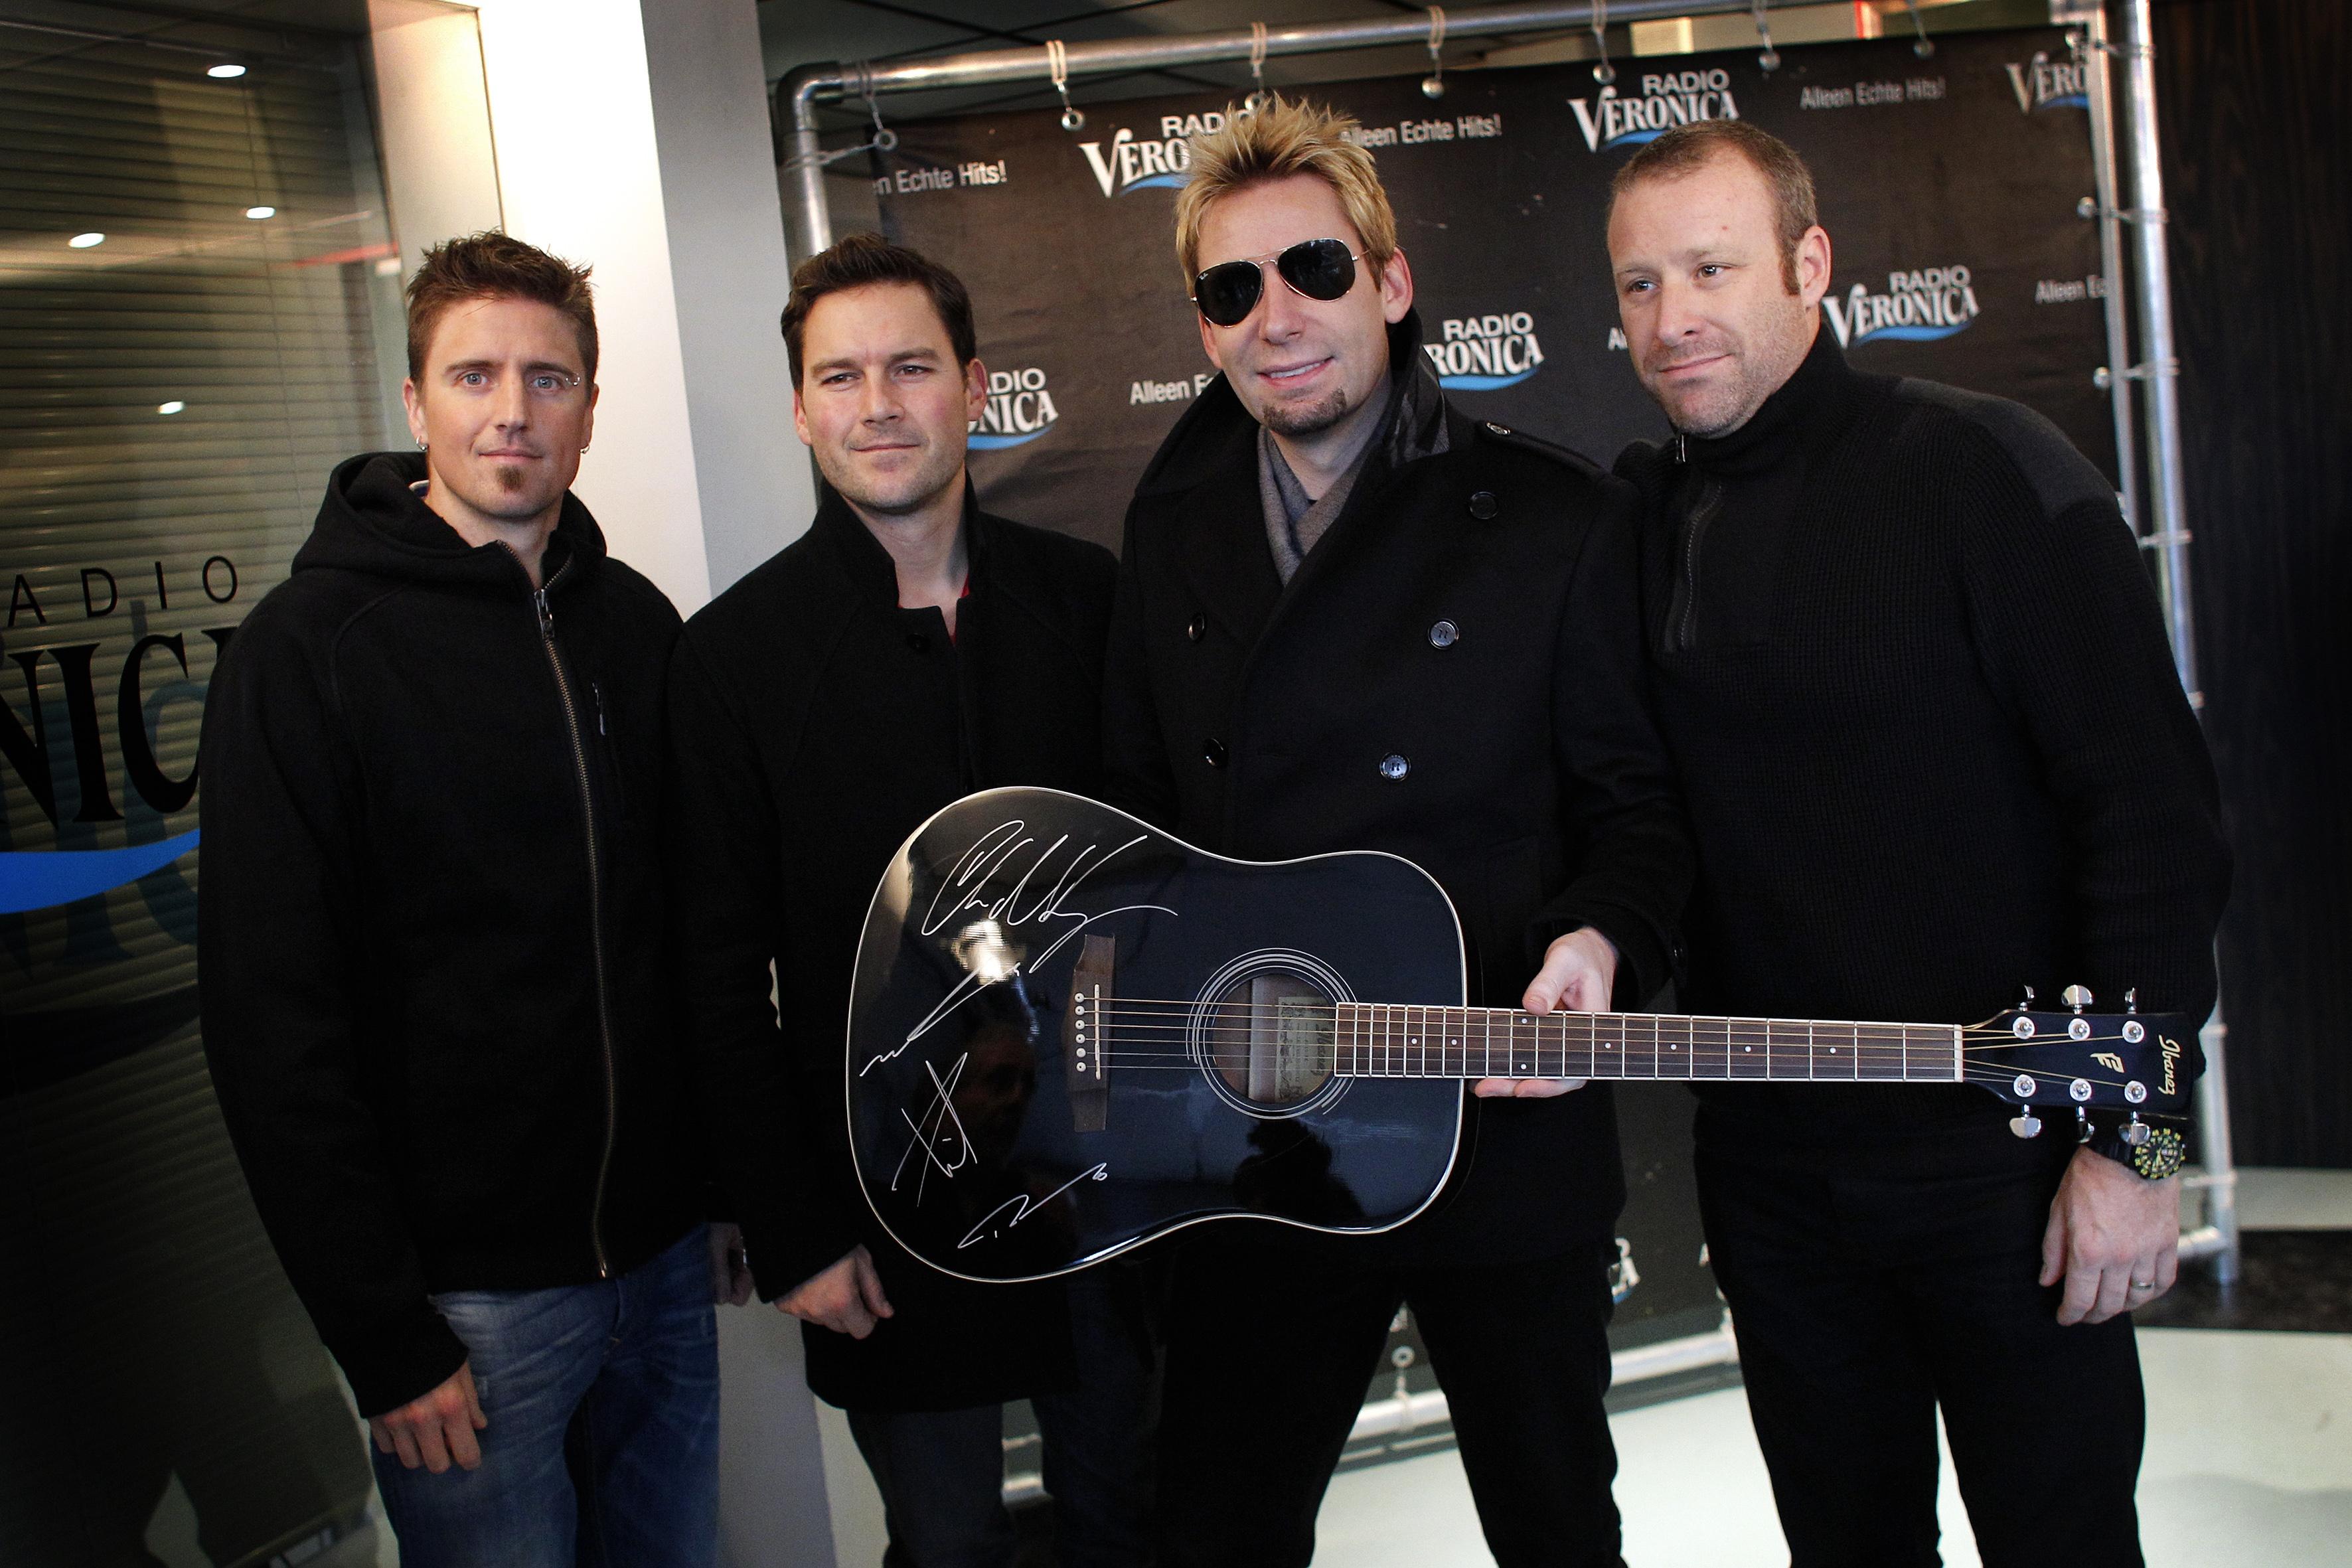 Members of Canadian rock band Nickelback